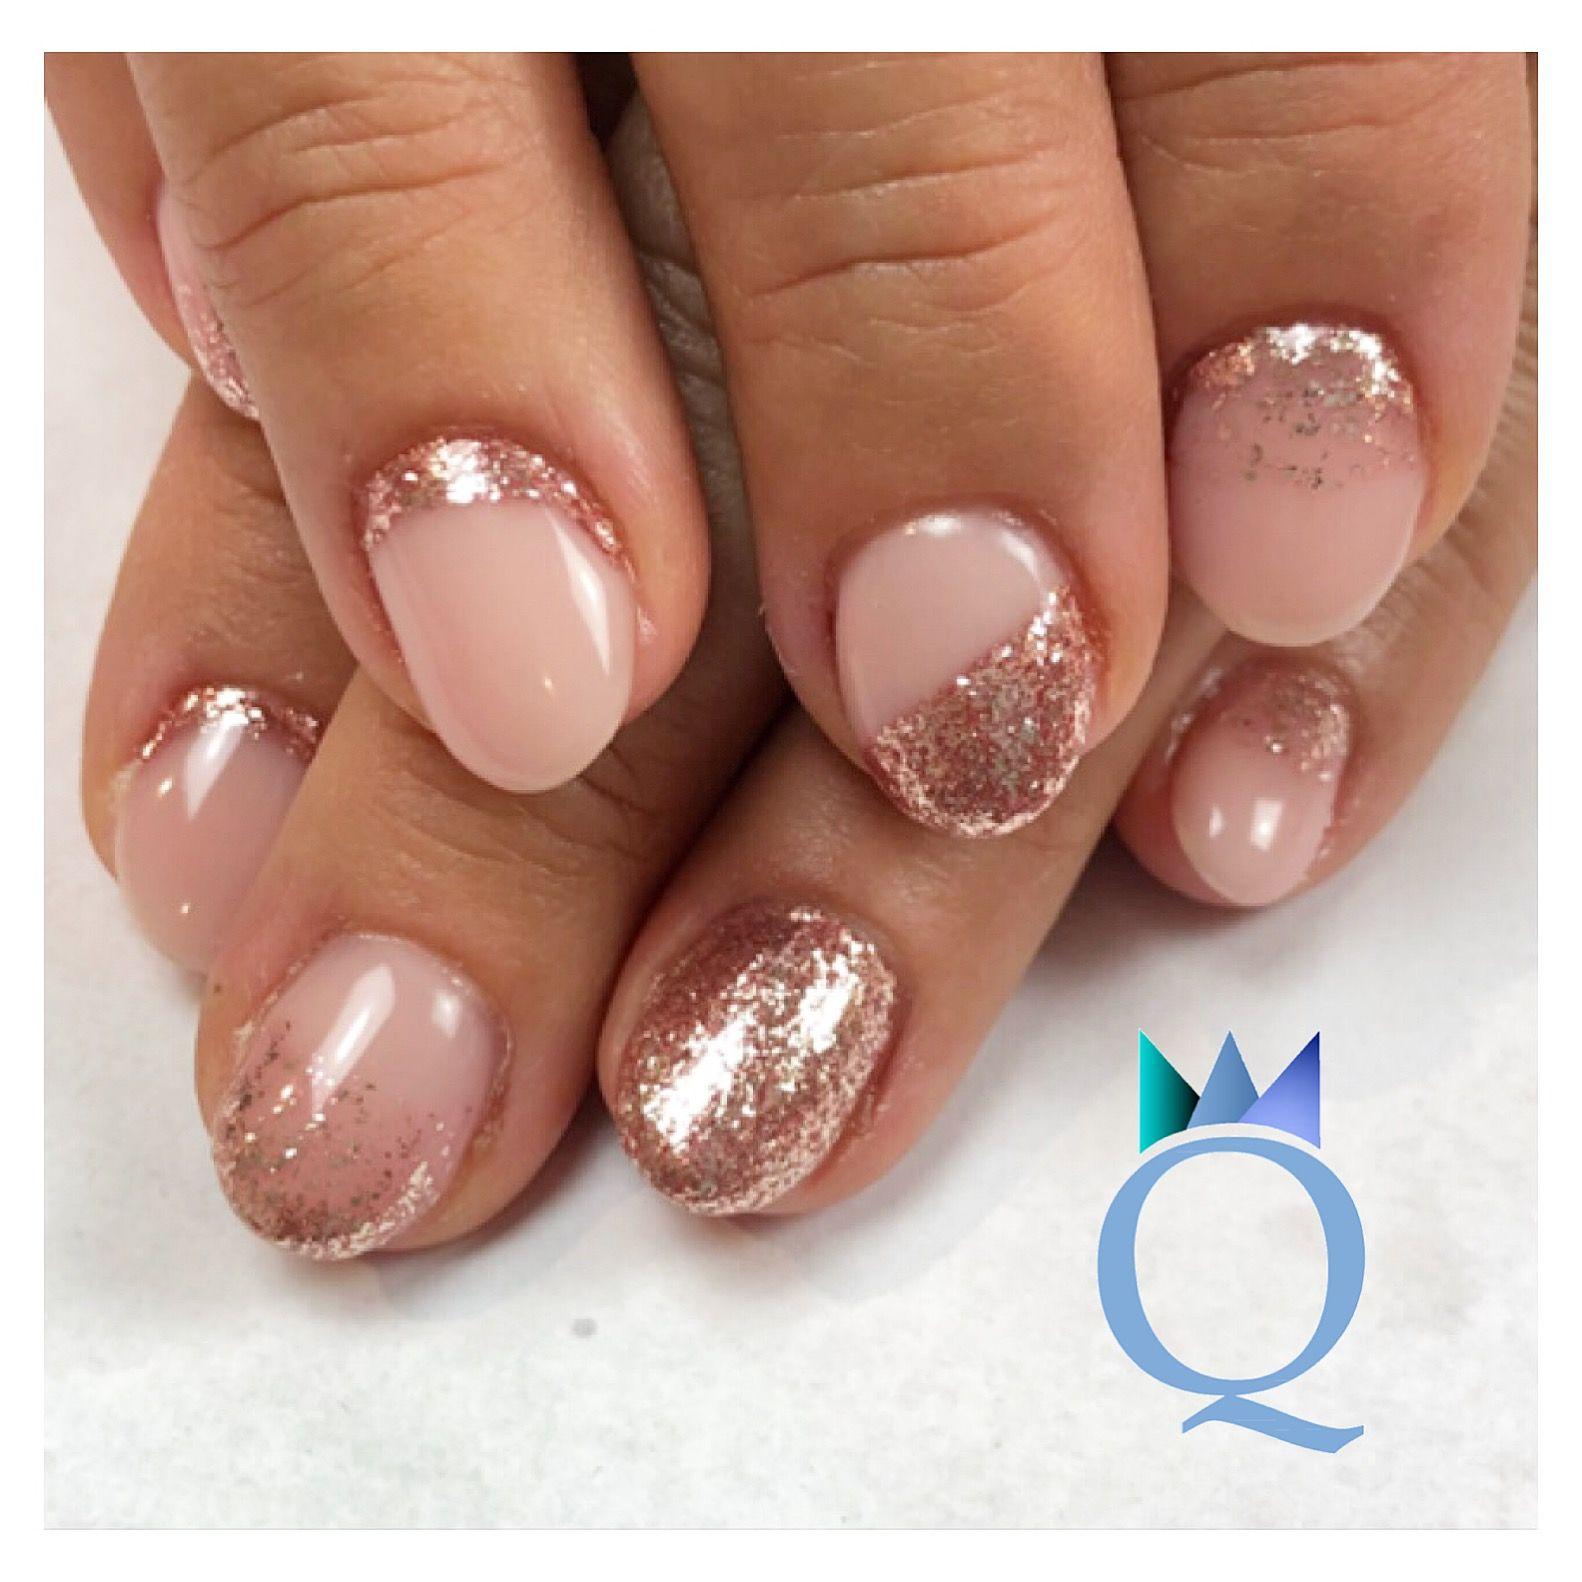 Gelnails Nails Nailart Naildesign Handpainted Gelnagel Nagel Nagelkunst Nageldesign Handgezeichnet Nagelstudio Mohlin Nageldesign Nagelstudio Nails